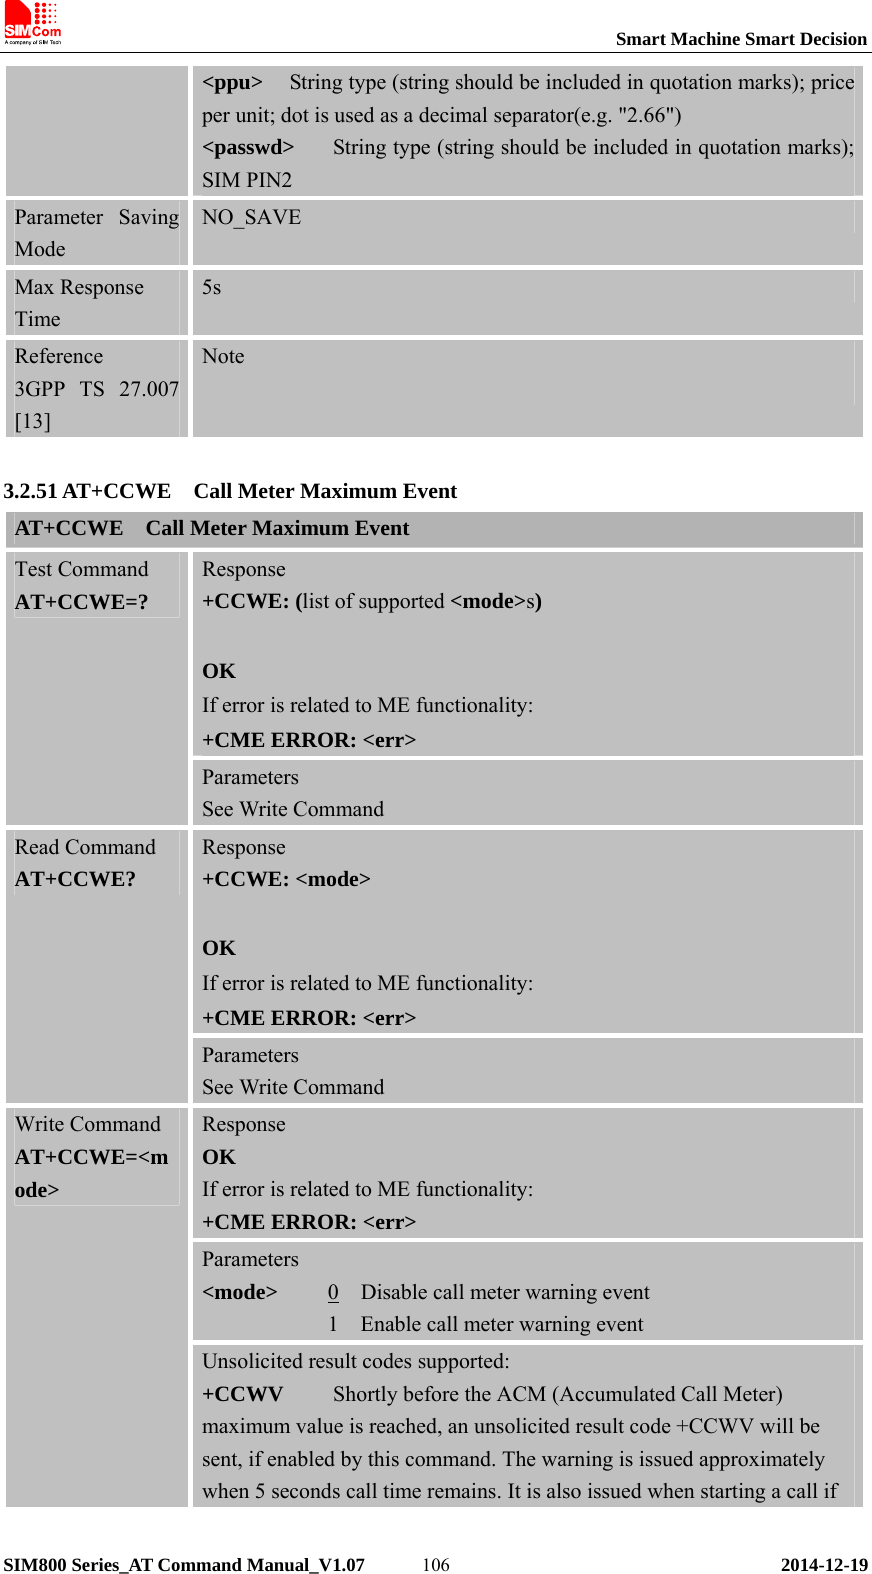 Name: SIM800 Series AT Command Manual V1 07